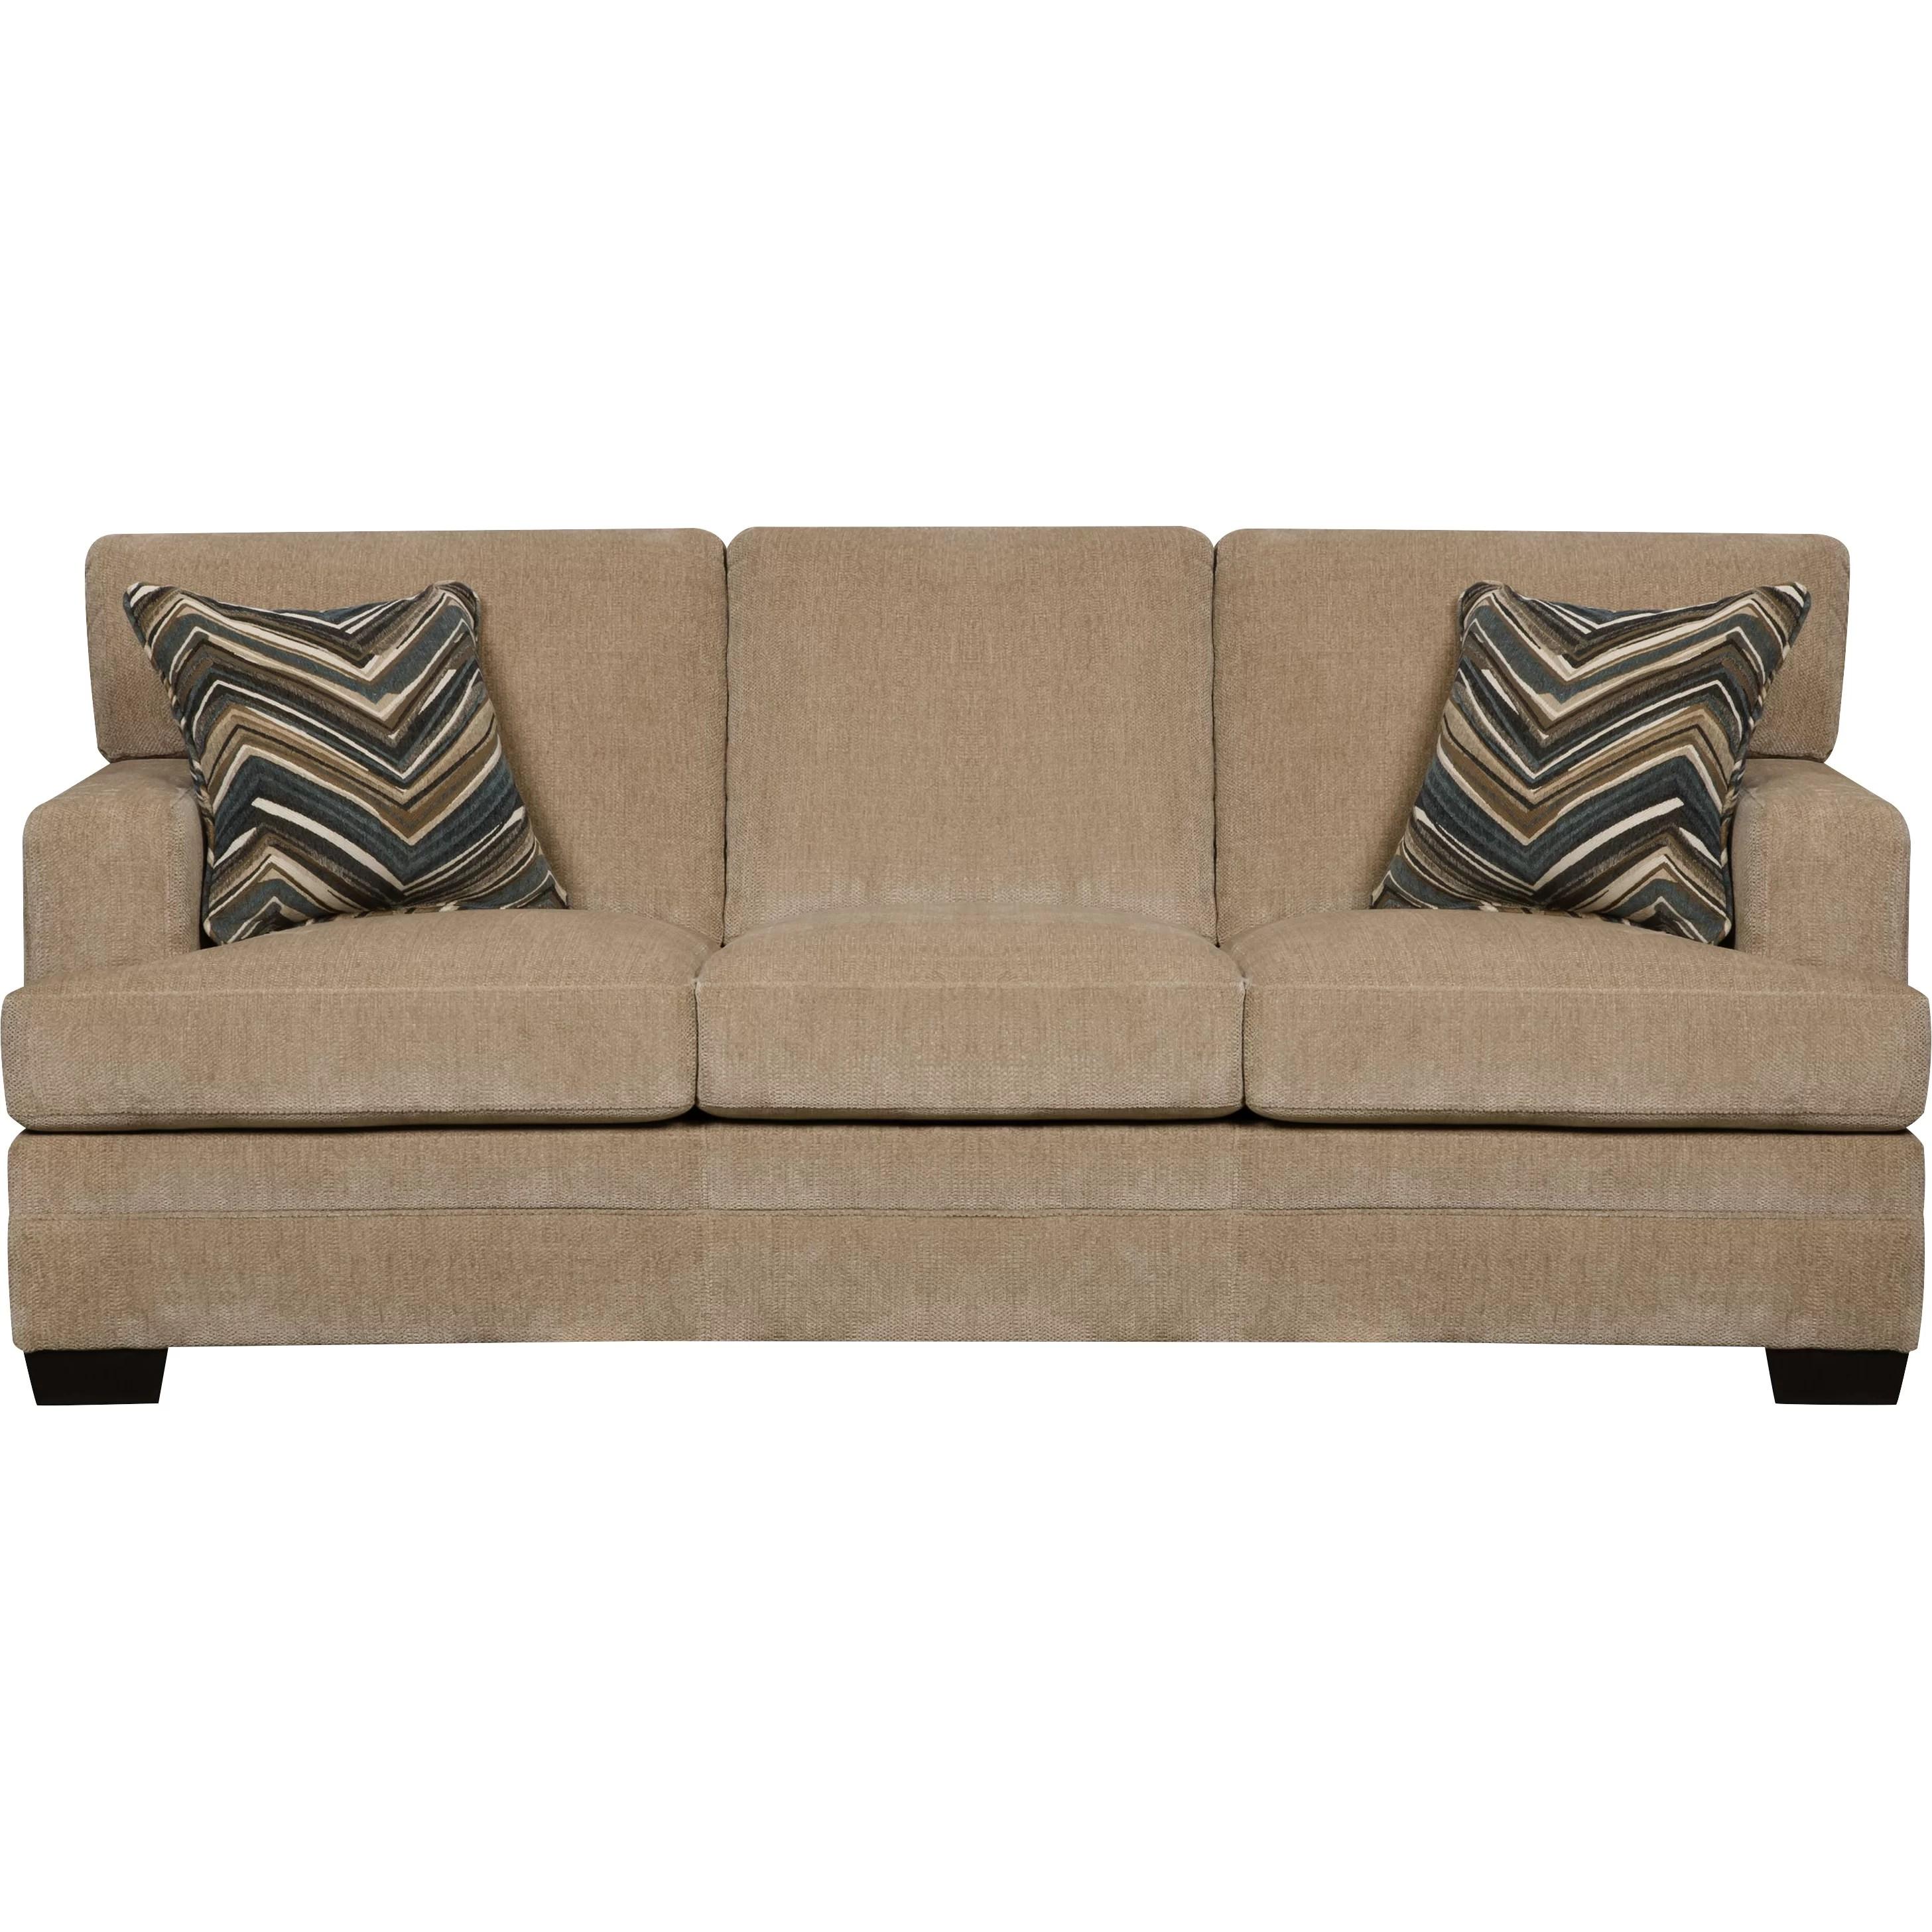 Simmons Upholstery Sassy Barley Sleeper Sofa Reviews Wayfair